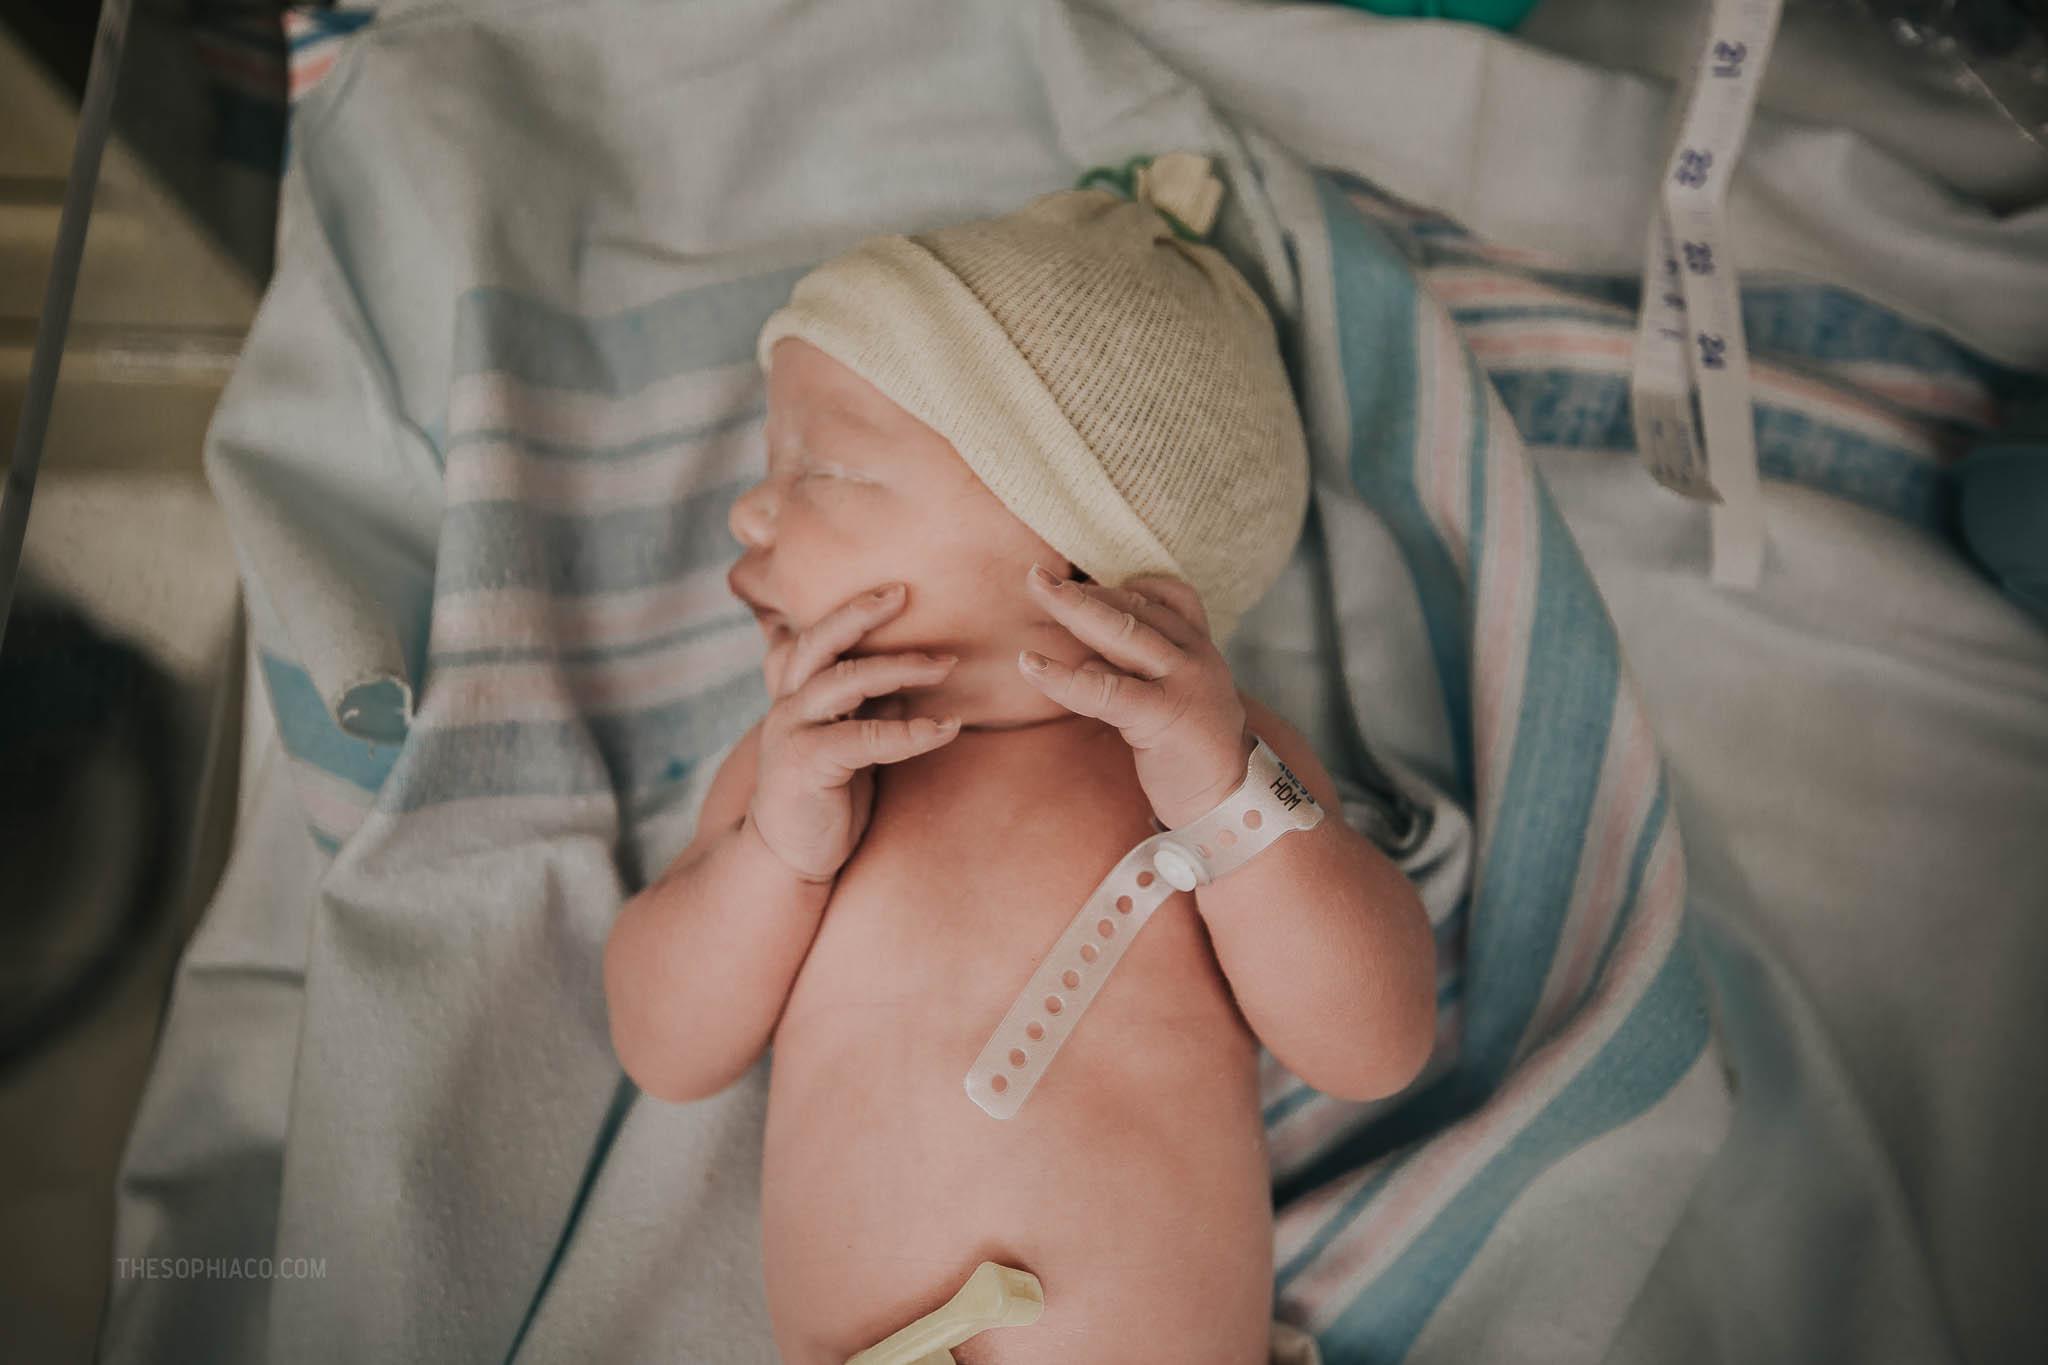 Oahu-Birth-Photographer-scheduled-cesarean-kaiser-26.jpg